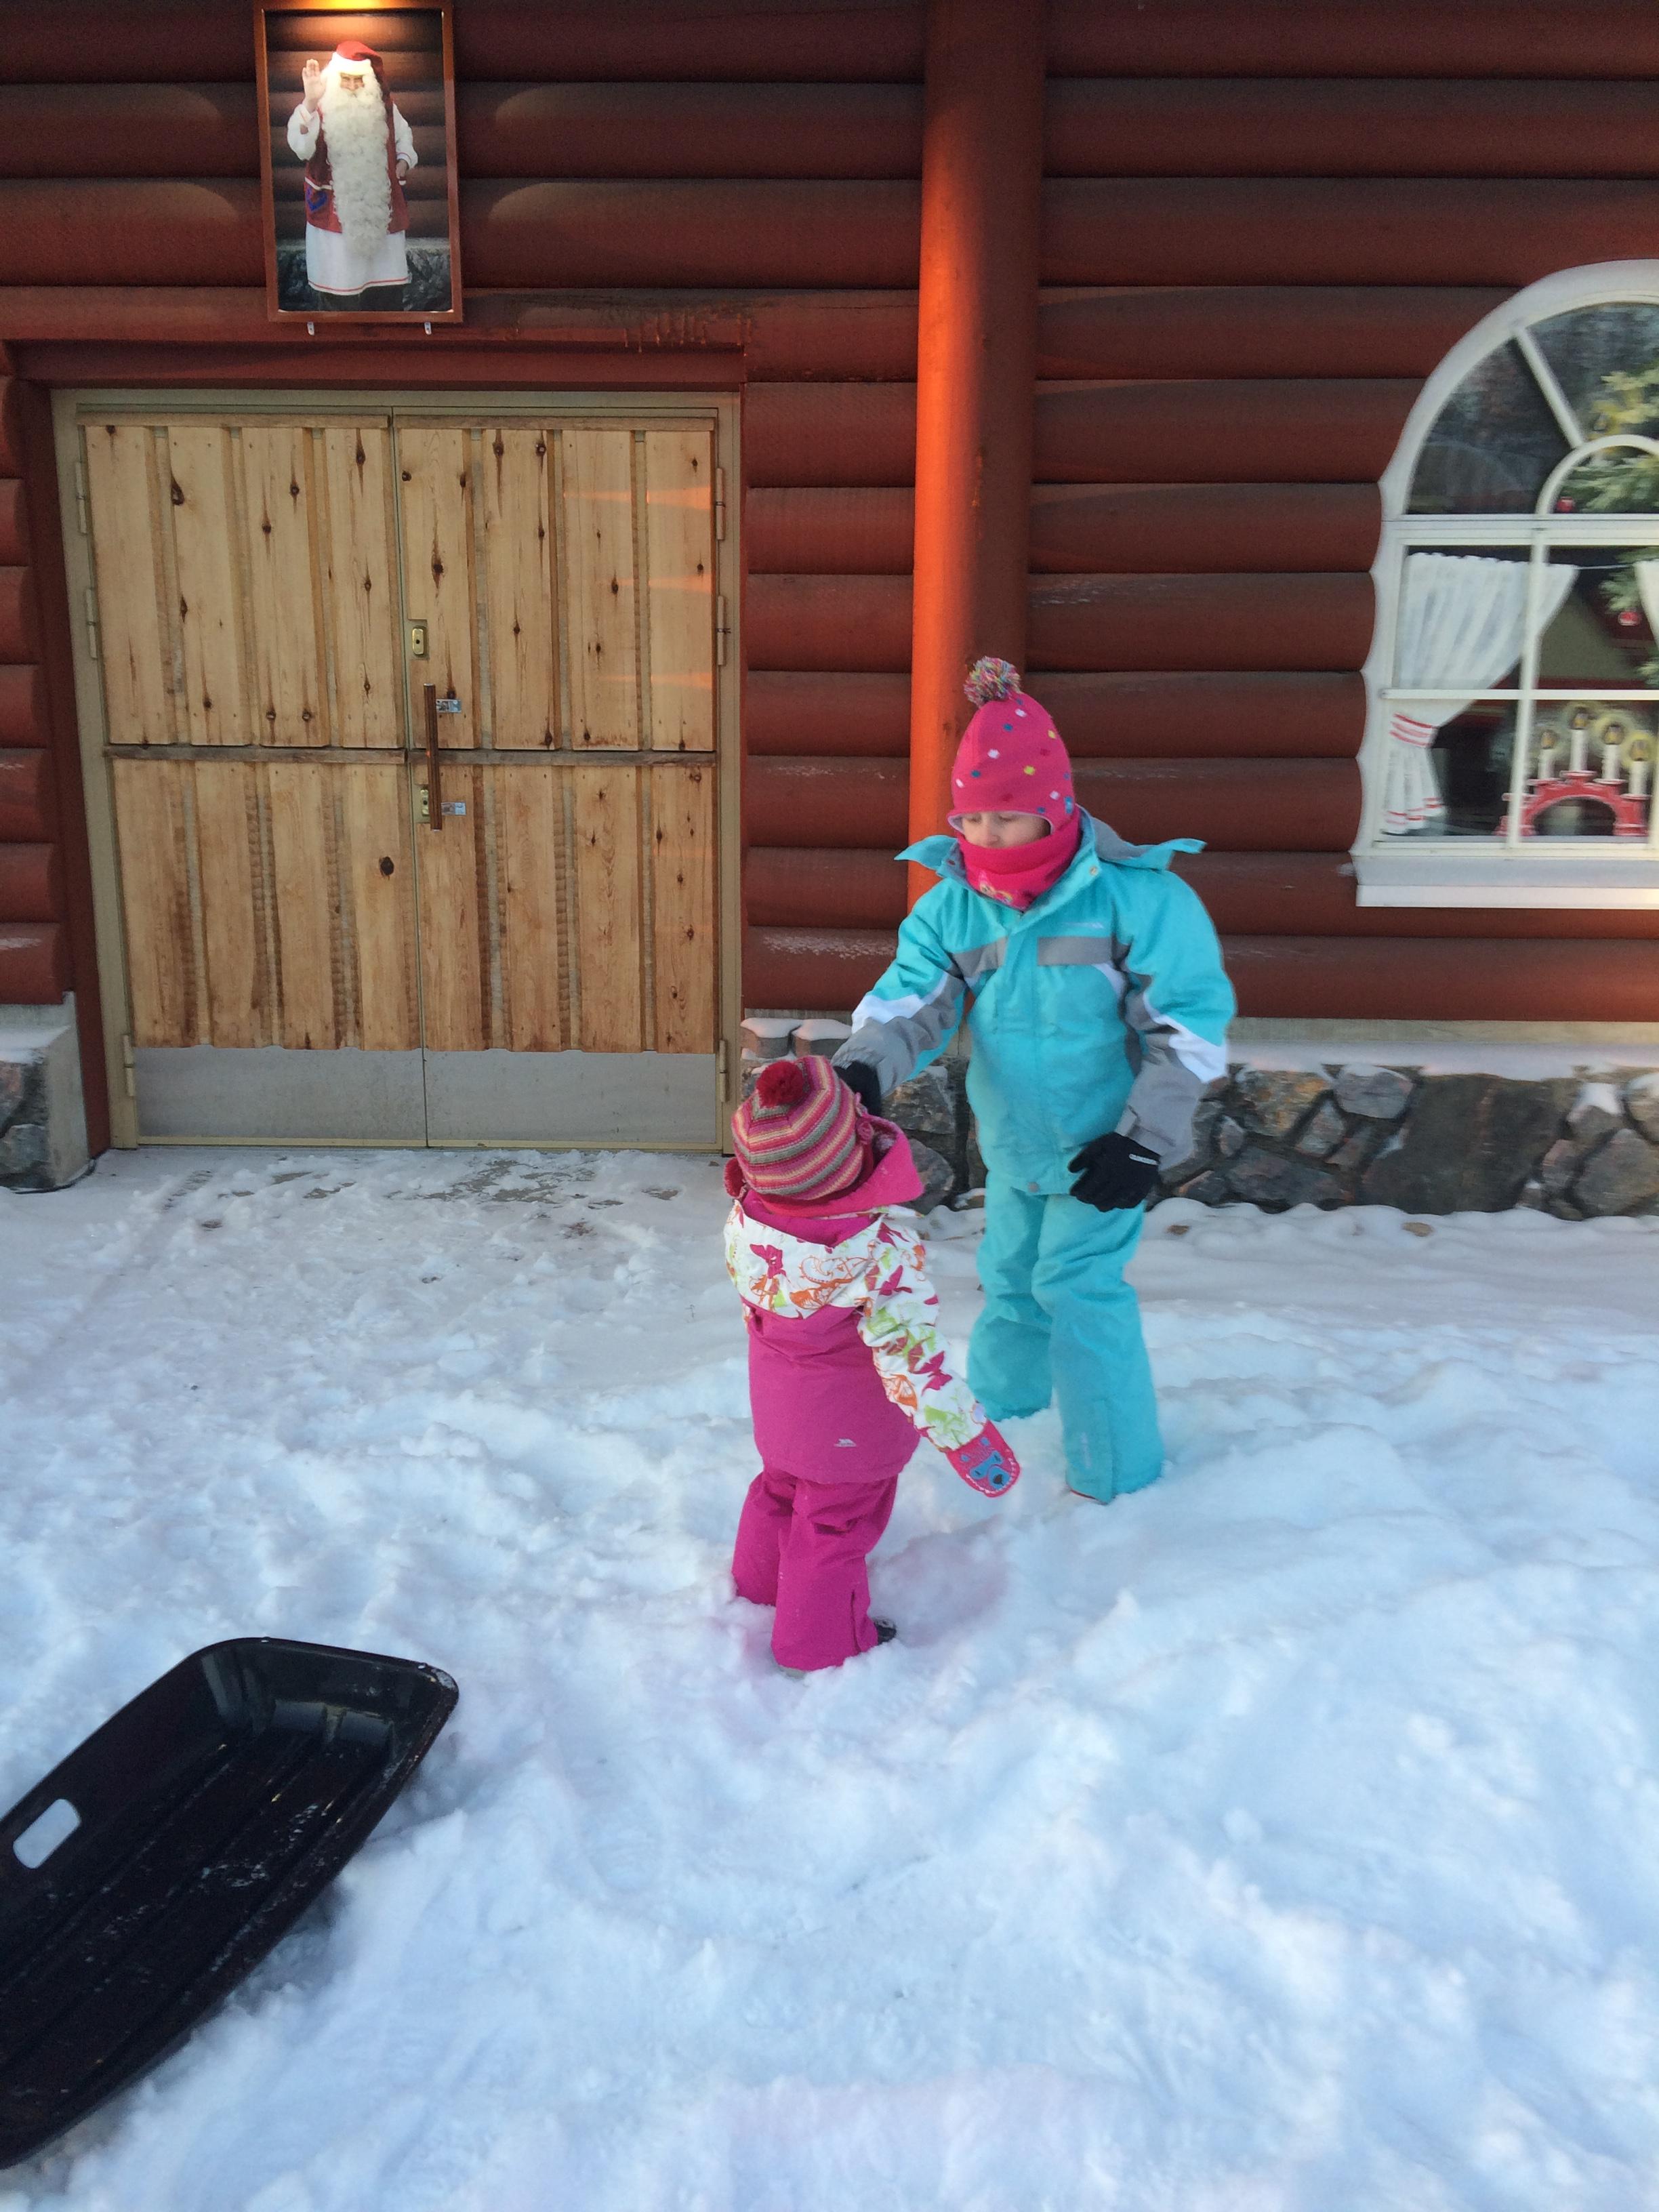 Enjoying the snow at Santa Claus Holiday Village in Rovaniemi, Finland